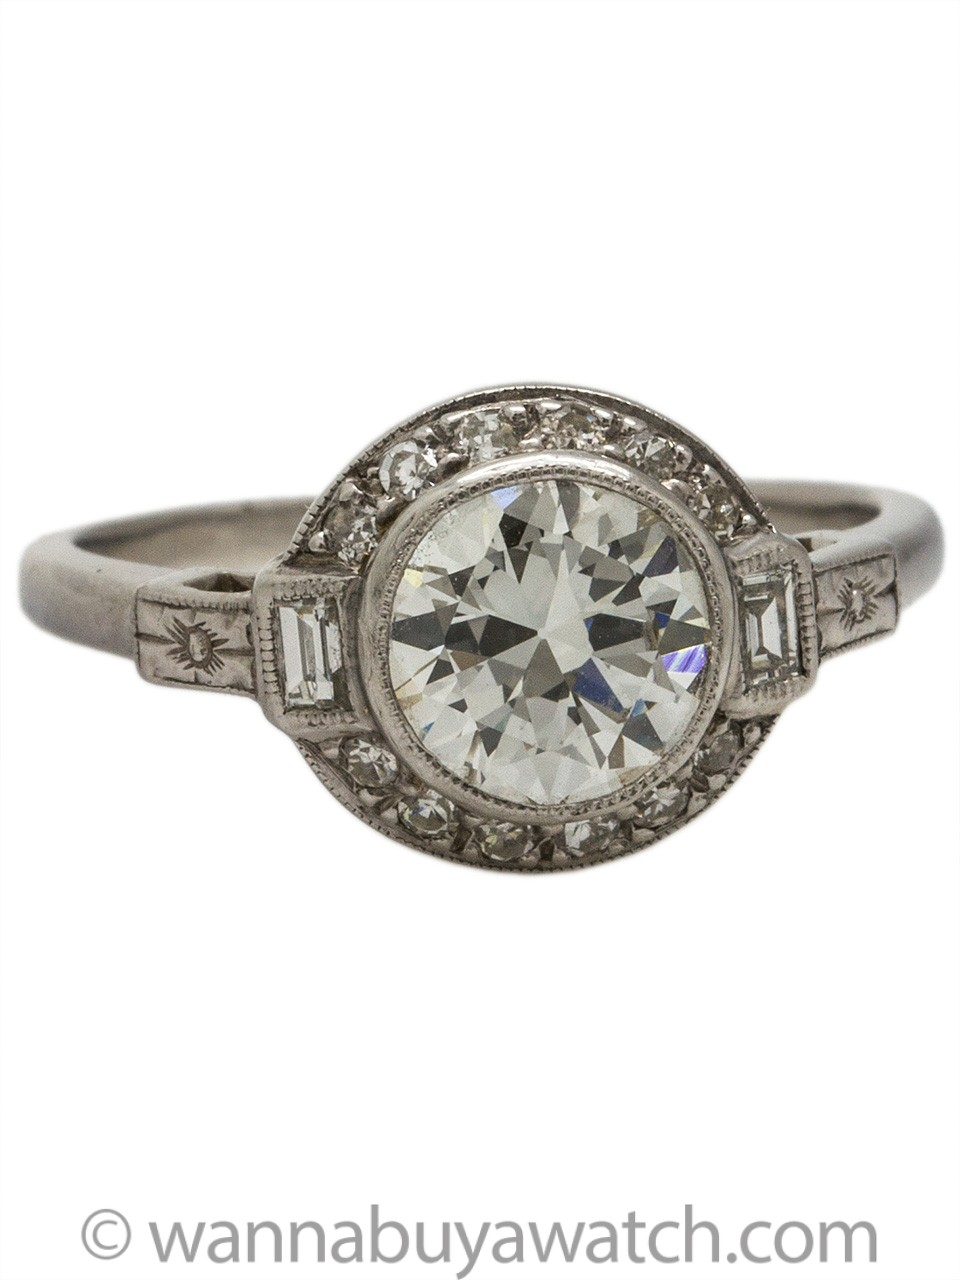 Vintage Engagement Ring Platinum 1.12ct Old European Cut H-VS1 circa 1930s